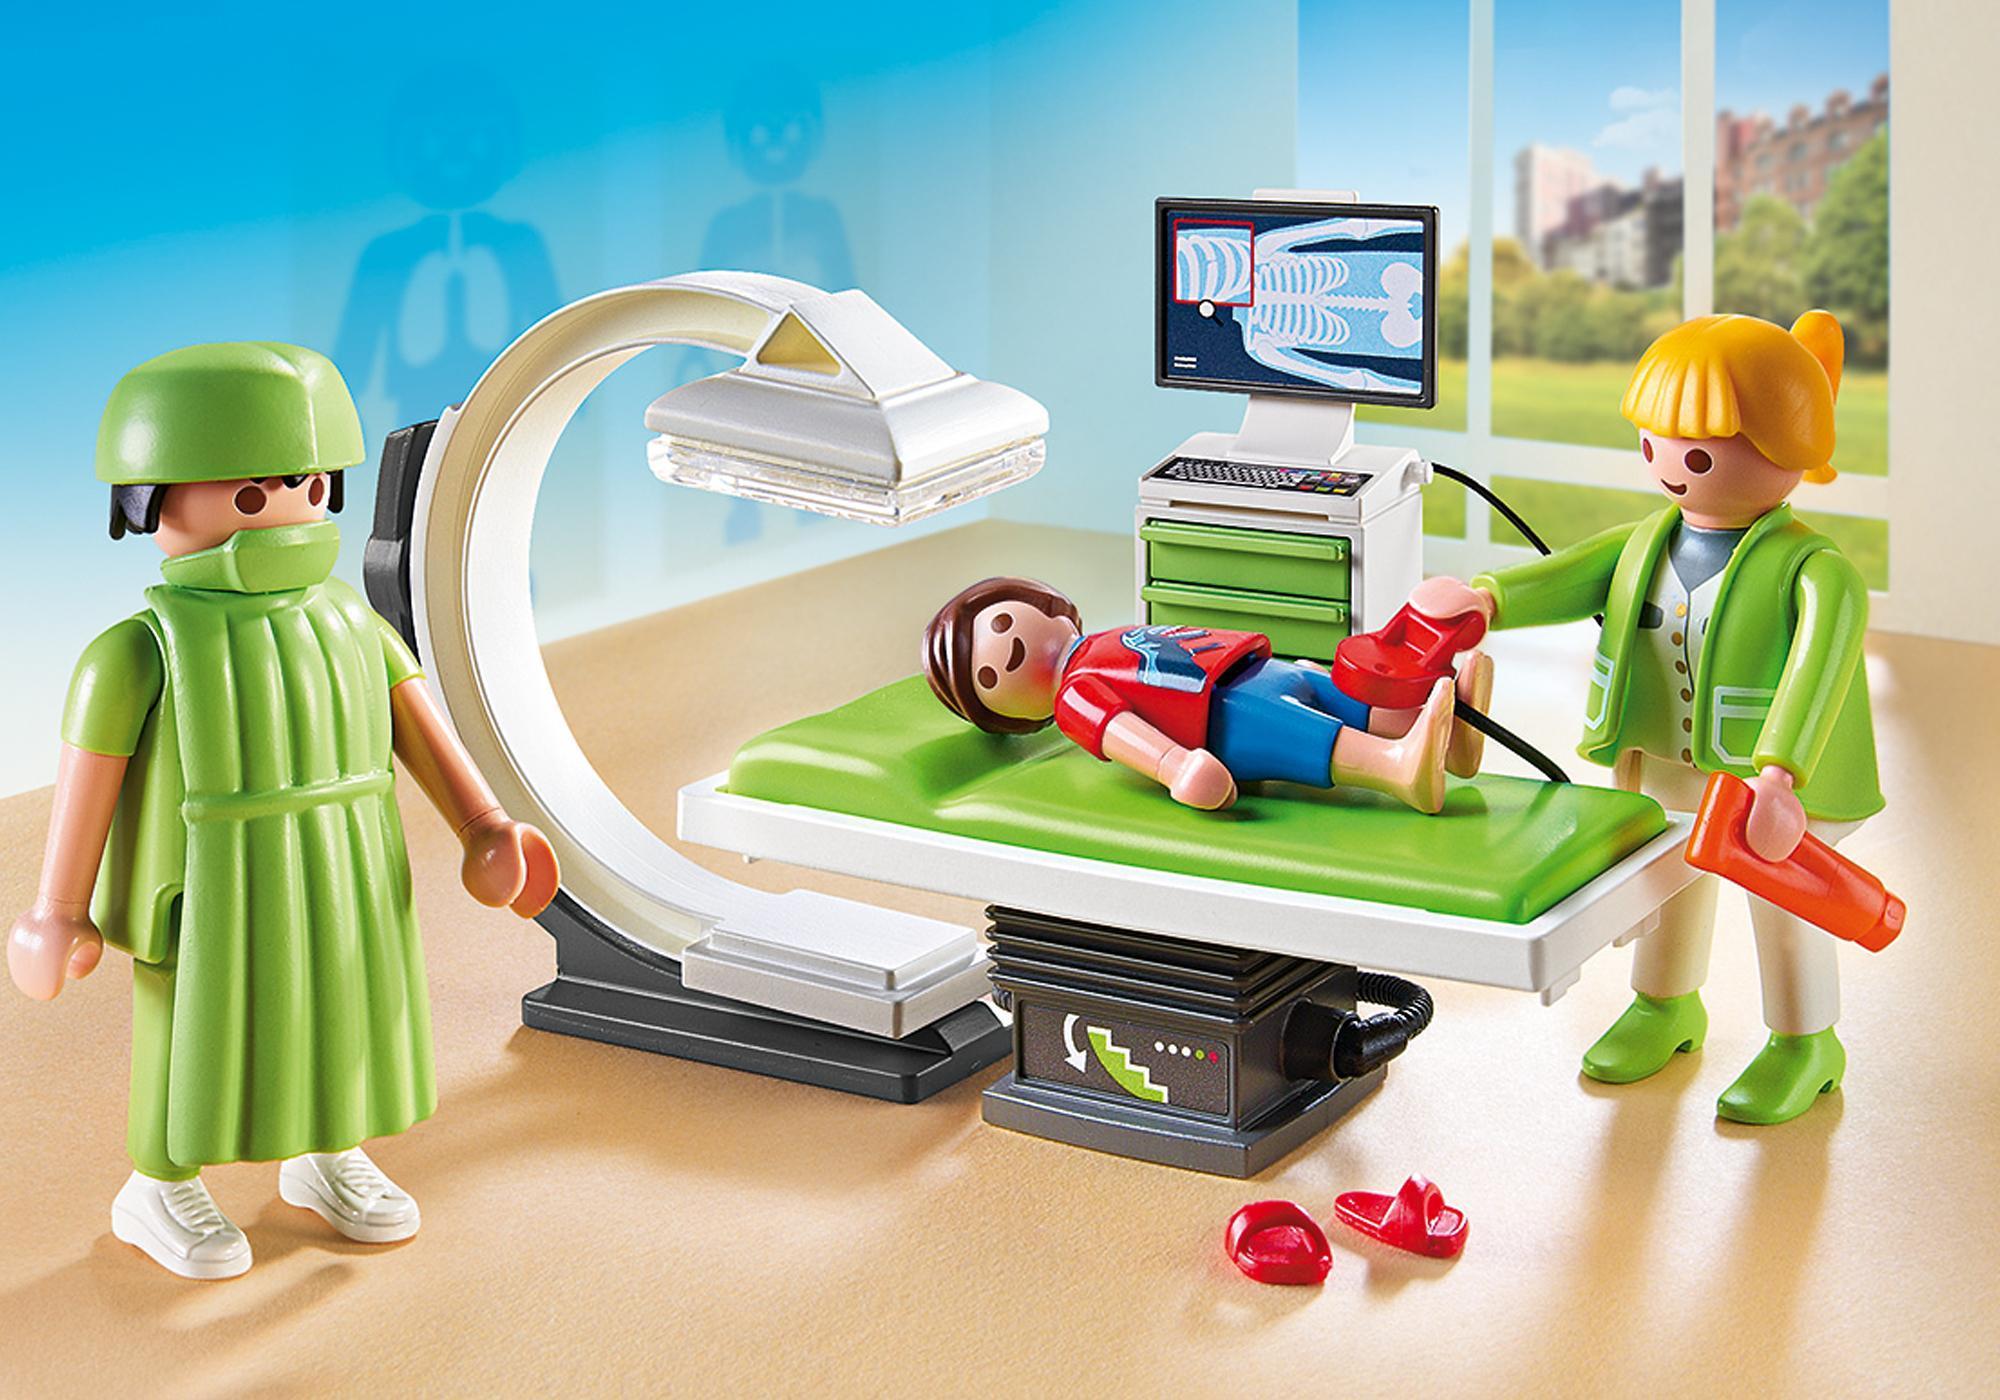 6659_product_detail/Ακτινολογικό Τμήμα Κλινικής